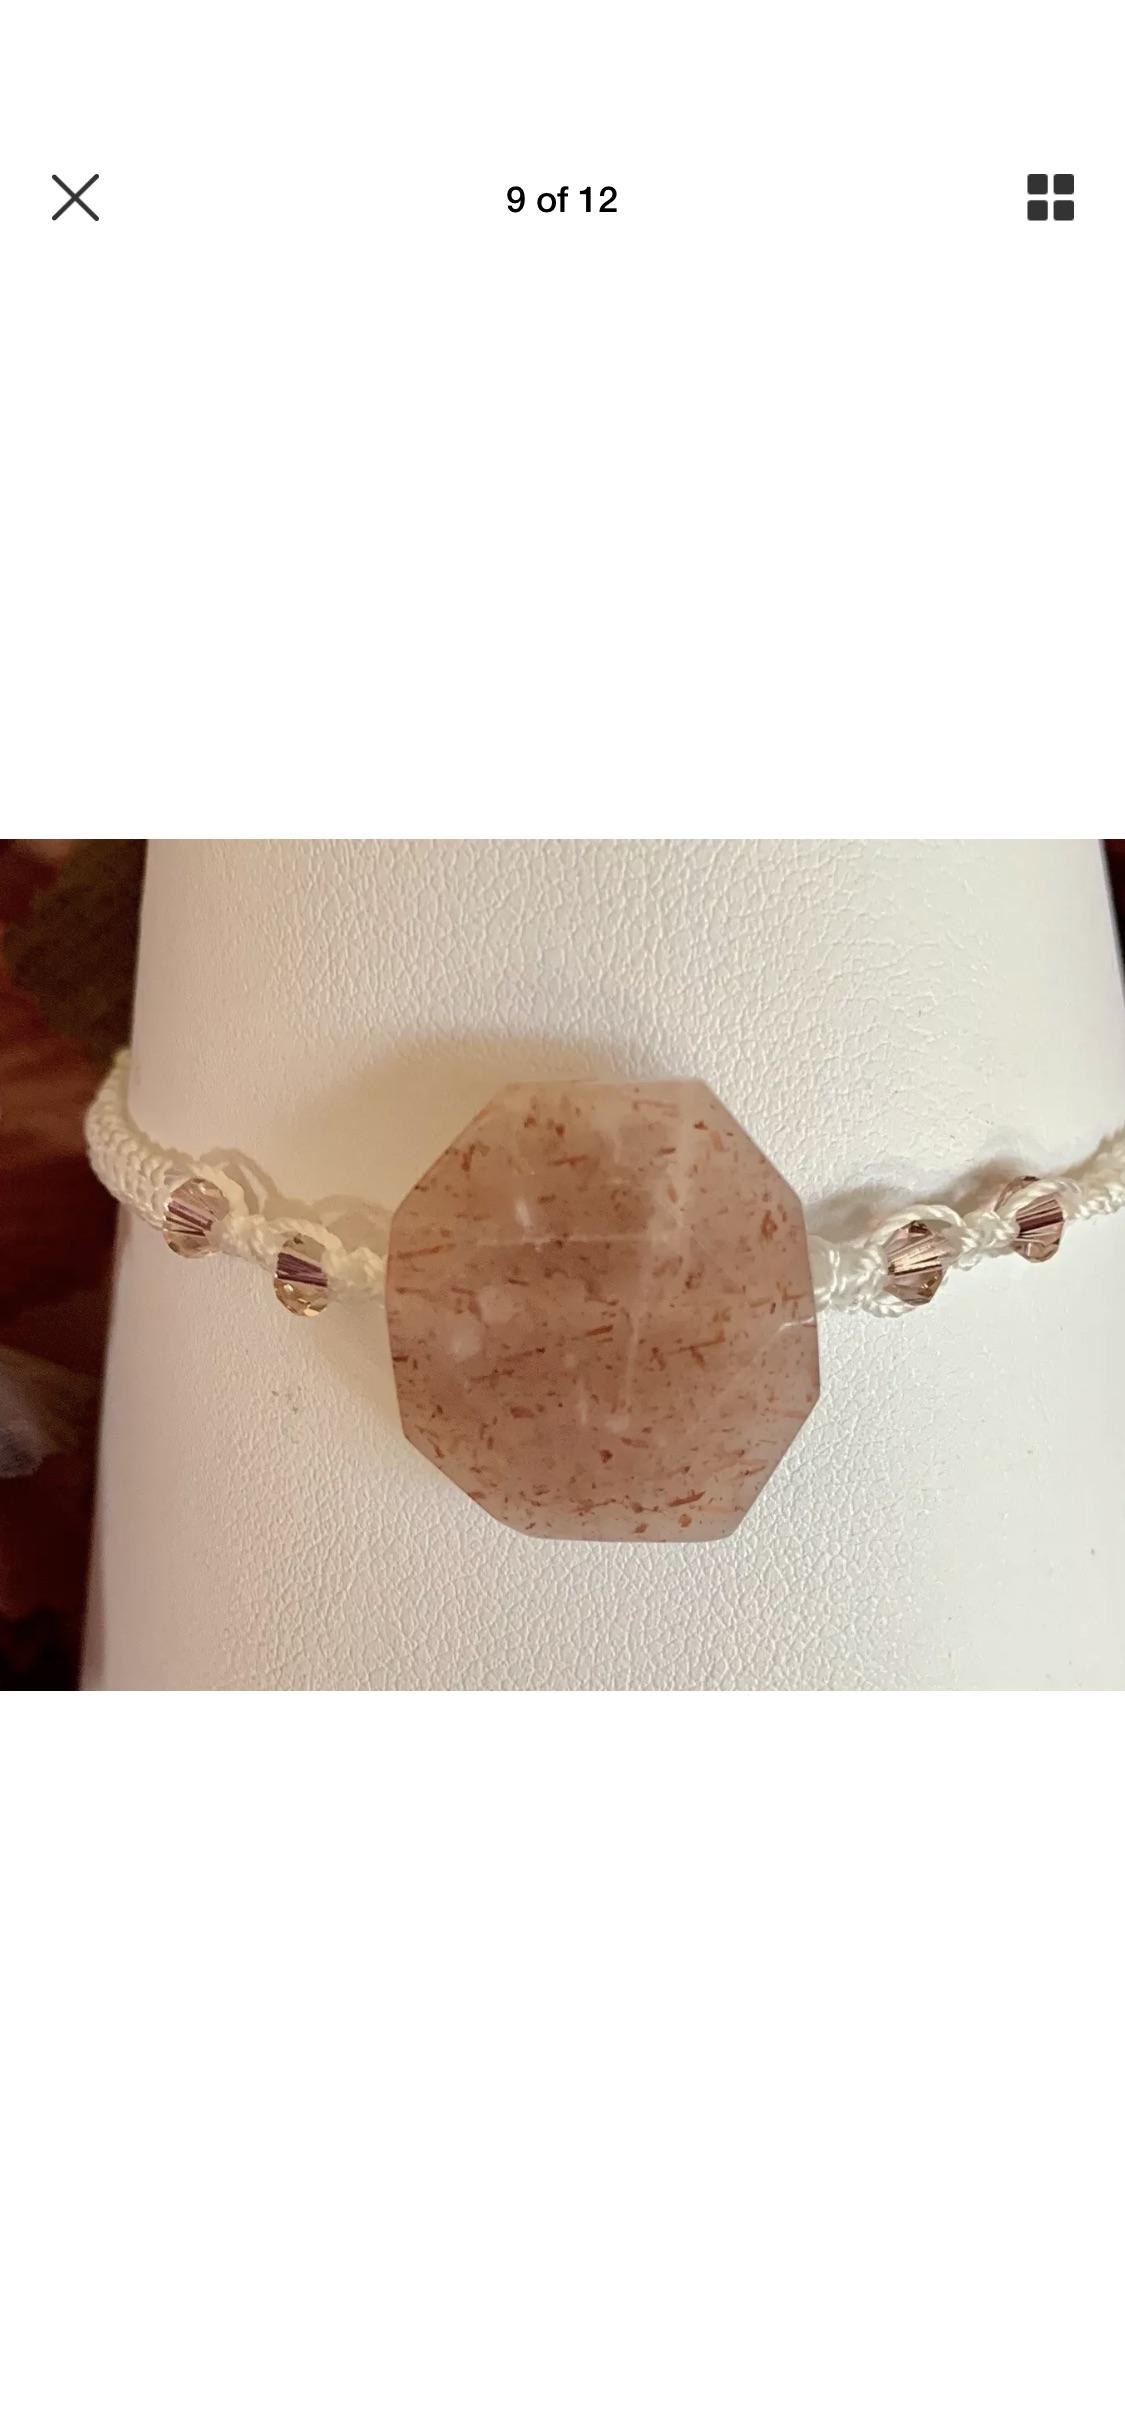 Lot 16 - Macrame Bracelet Lge Sunstone Swarovski elements each side very feminine Bracelet